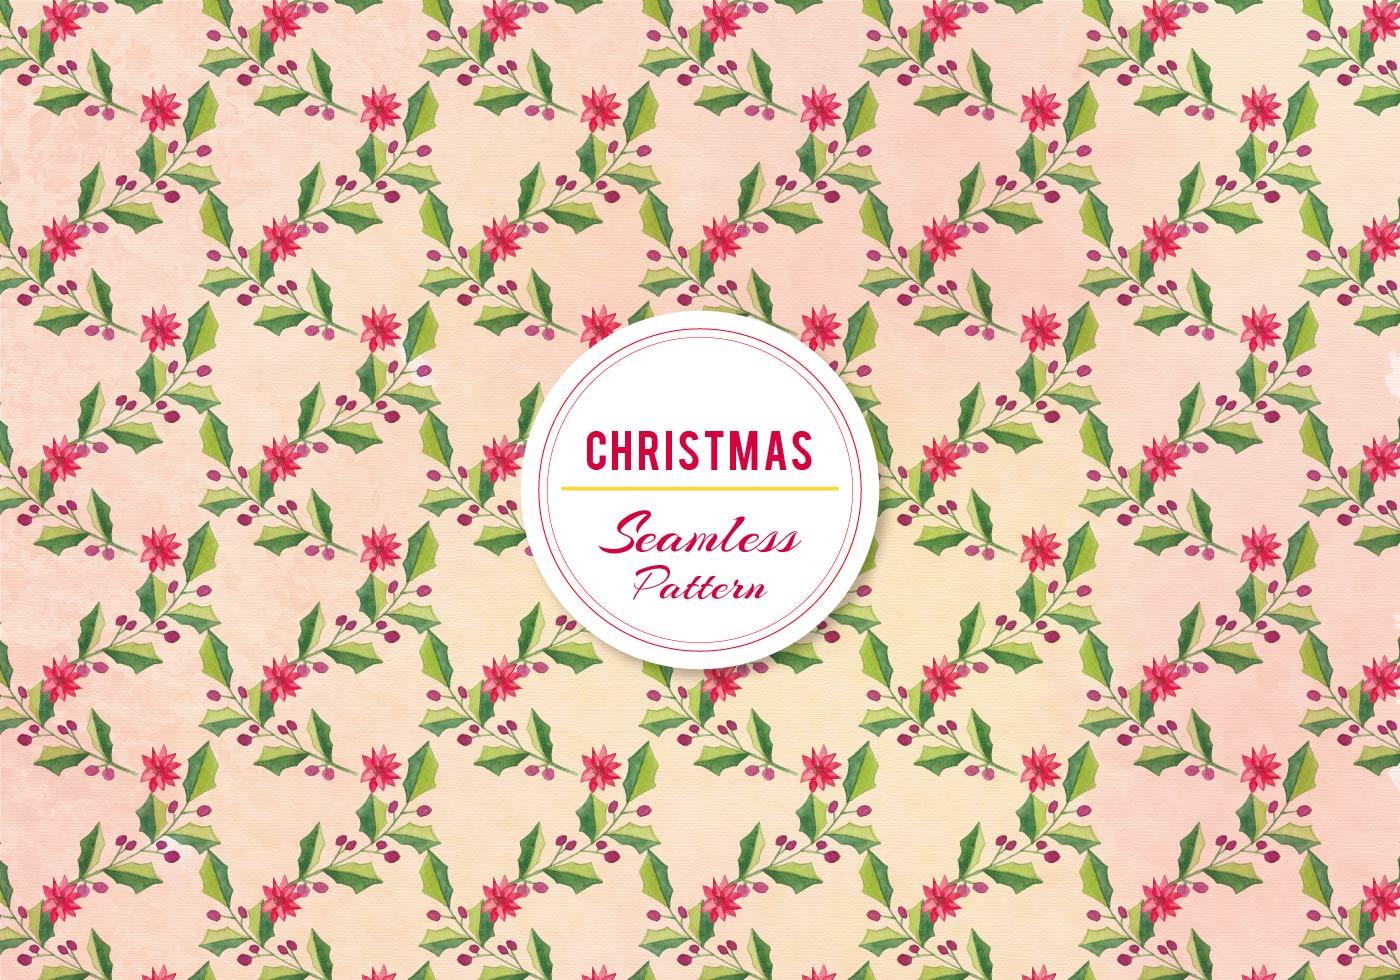 Cute Pink Snowman Wallpaper Vector Christmas Holly Pattern Download Free Vector Art